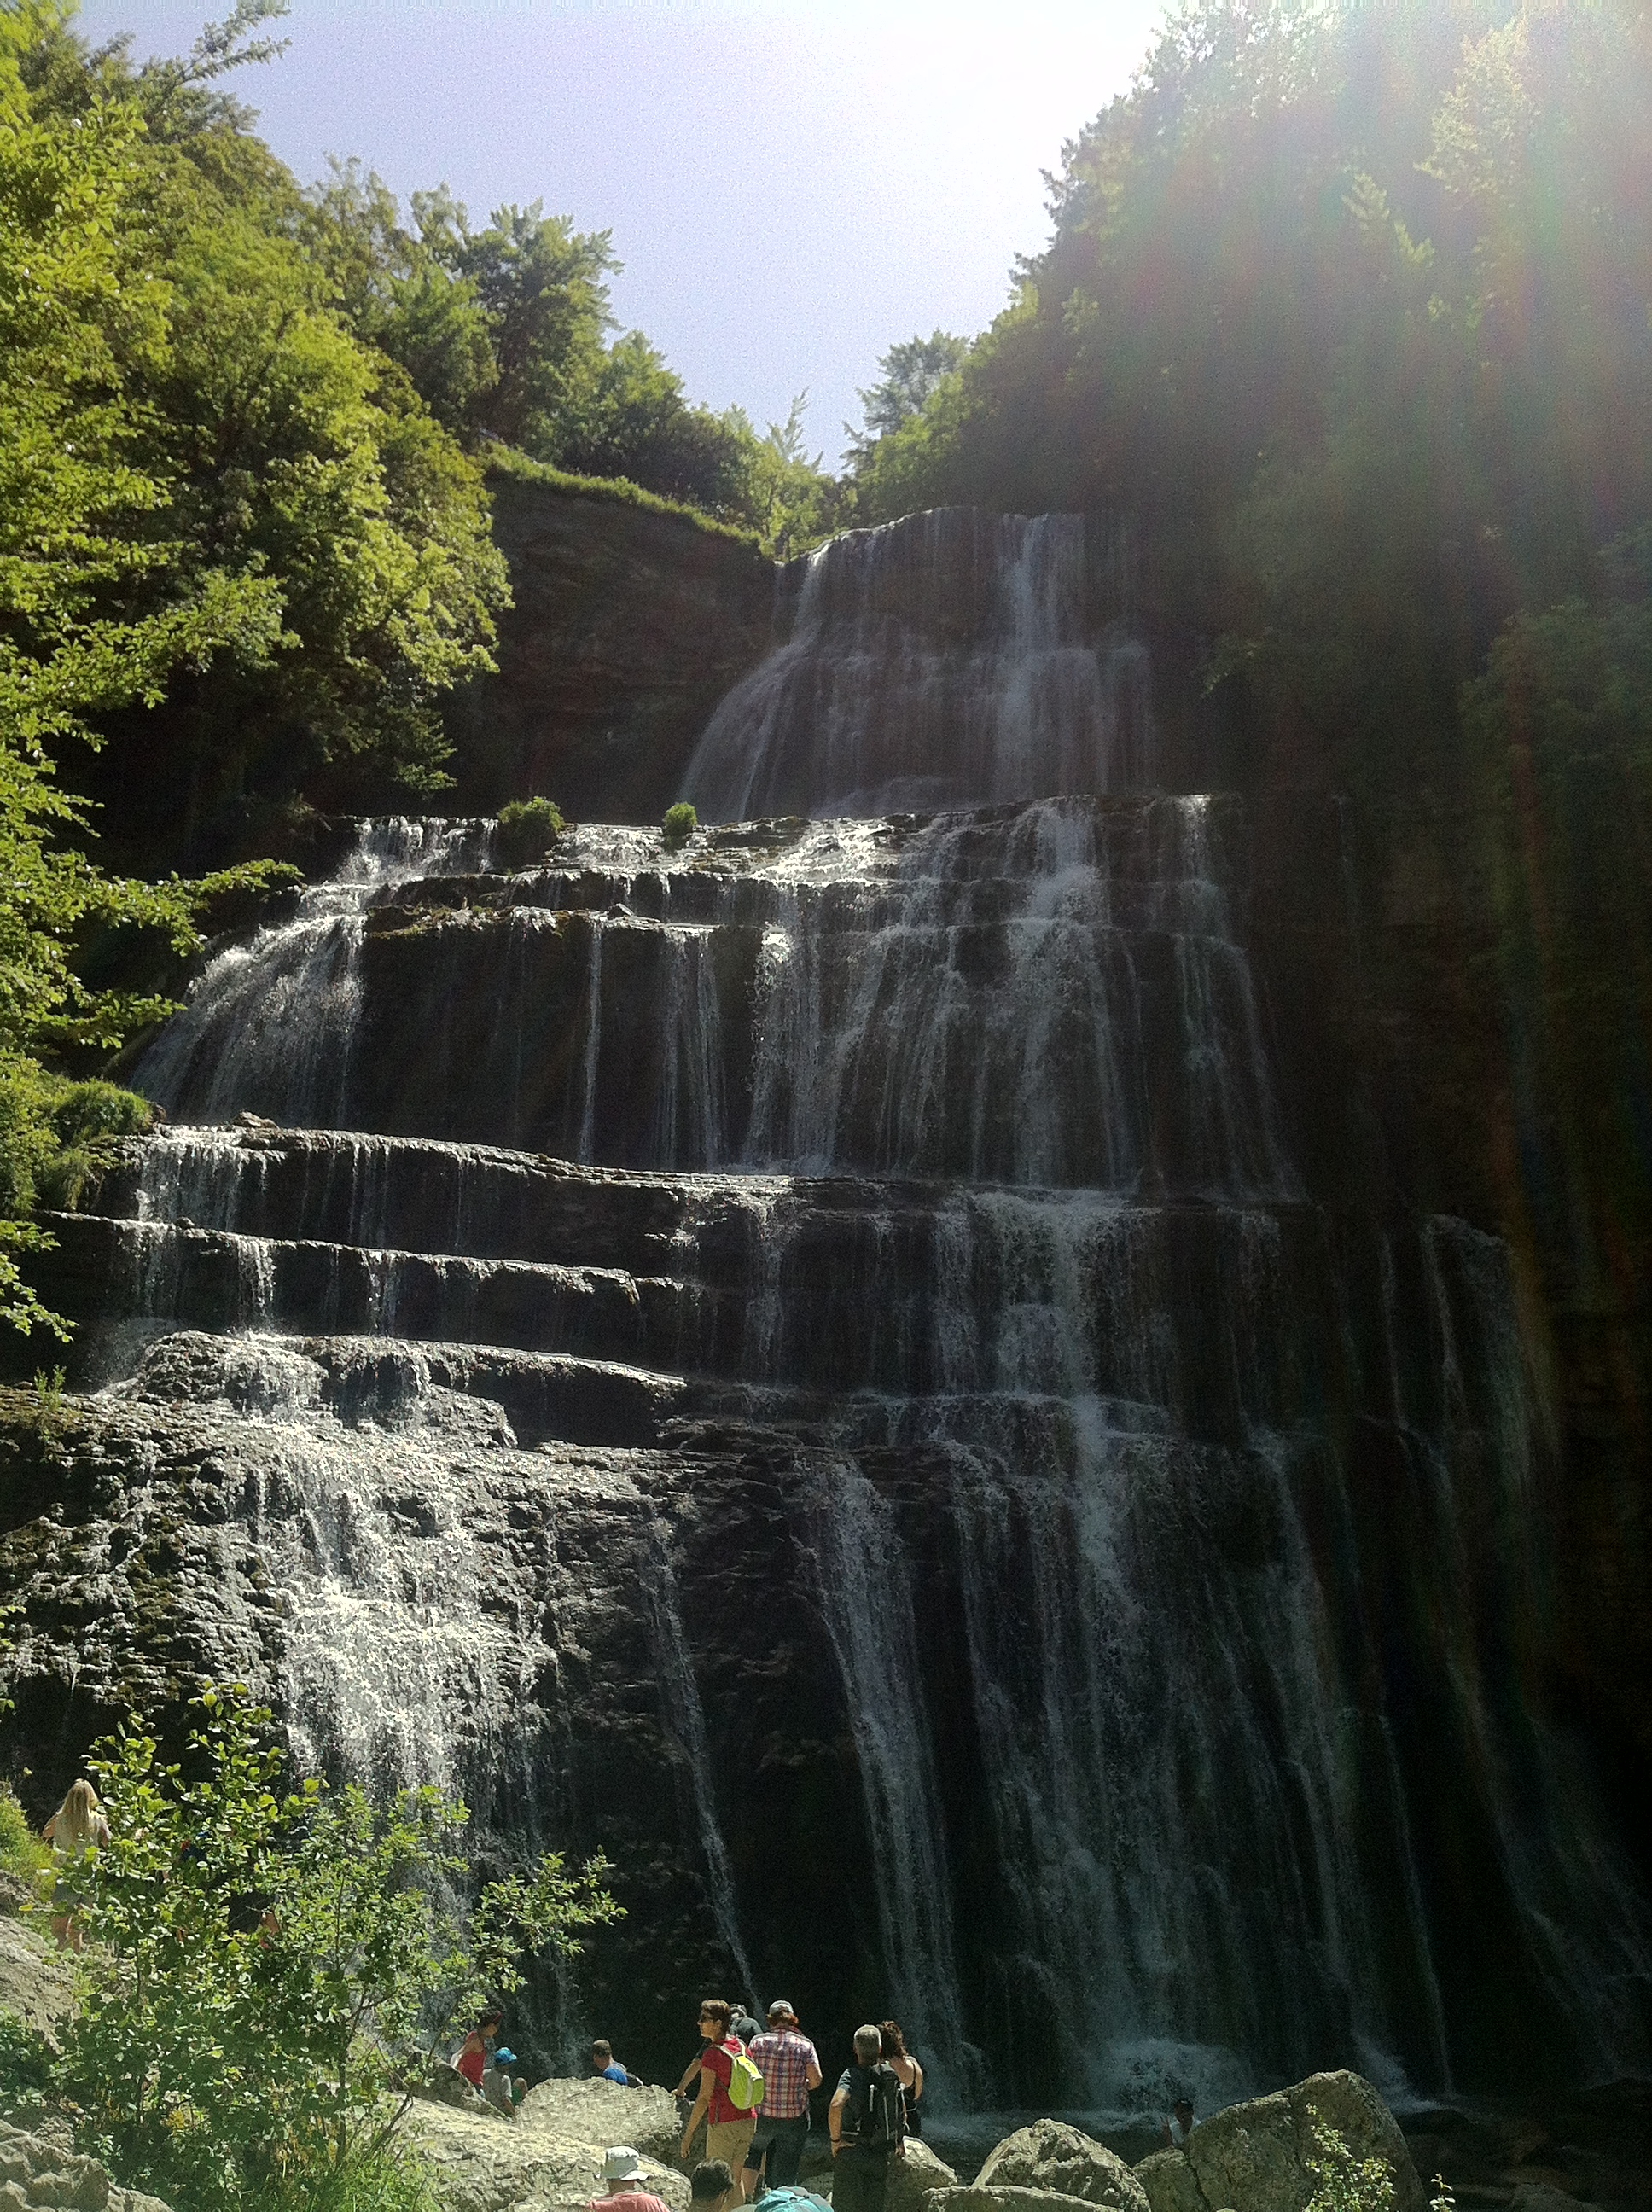 Les Cascades du Hérisson - Jura